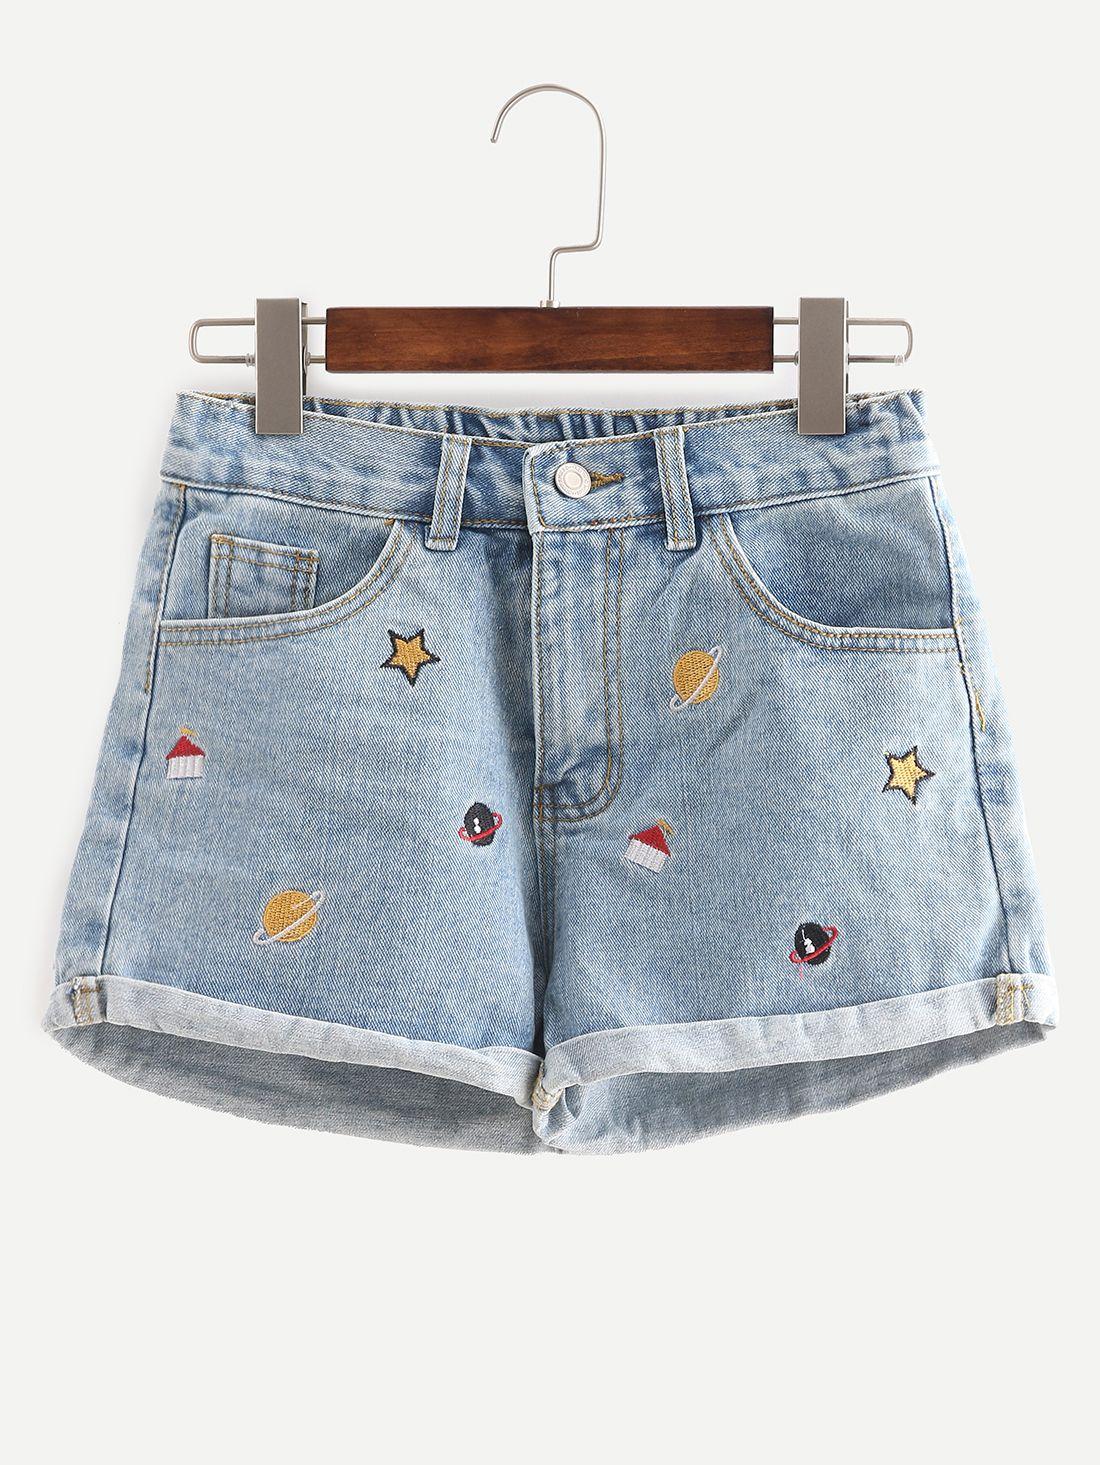 NWT GAP Best Girlfriend Embroidered Jean Shorts